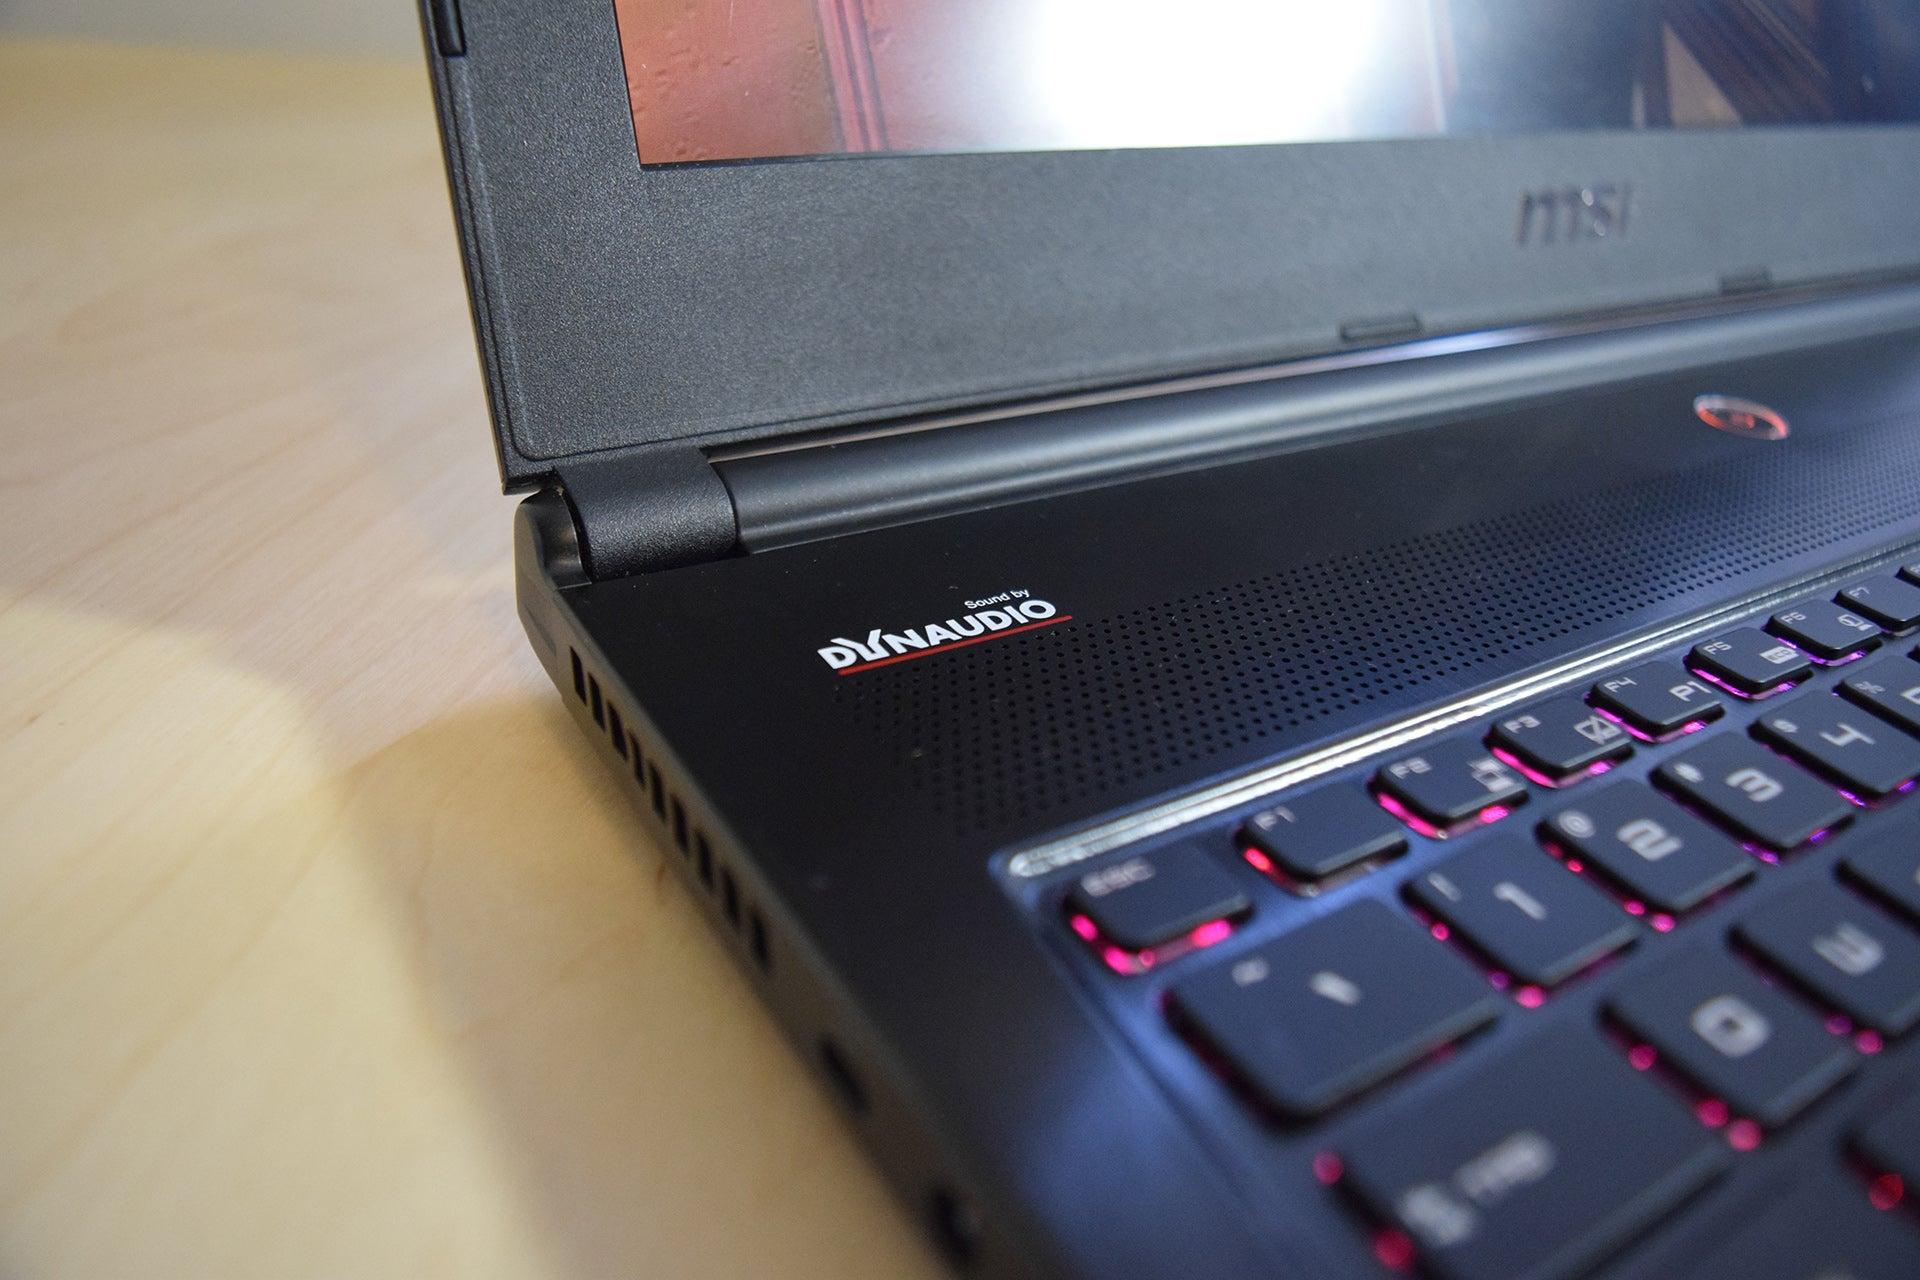 MSI GS60 Ghost Ultra-Thin Gaming Notebook: The Kotaku Review